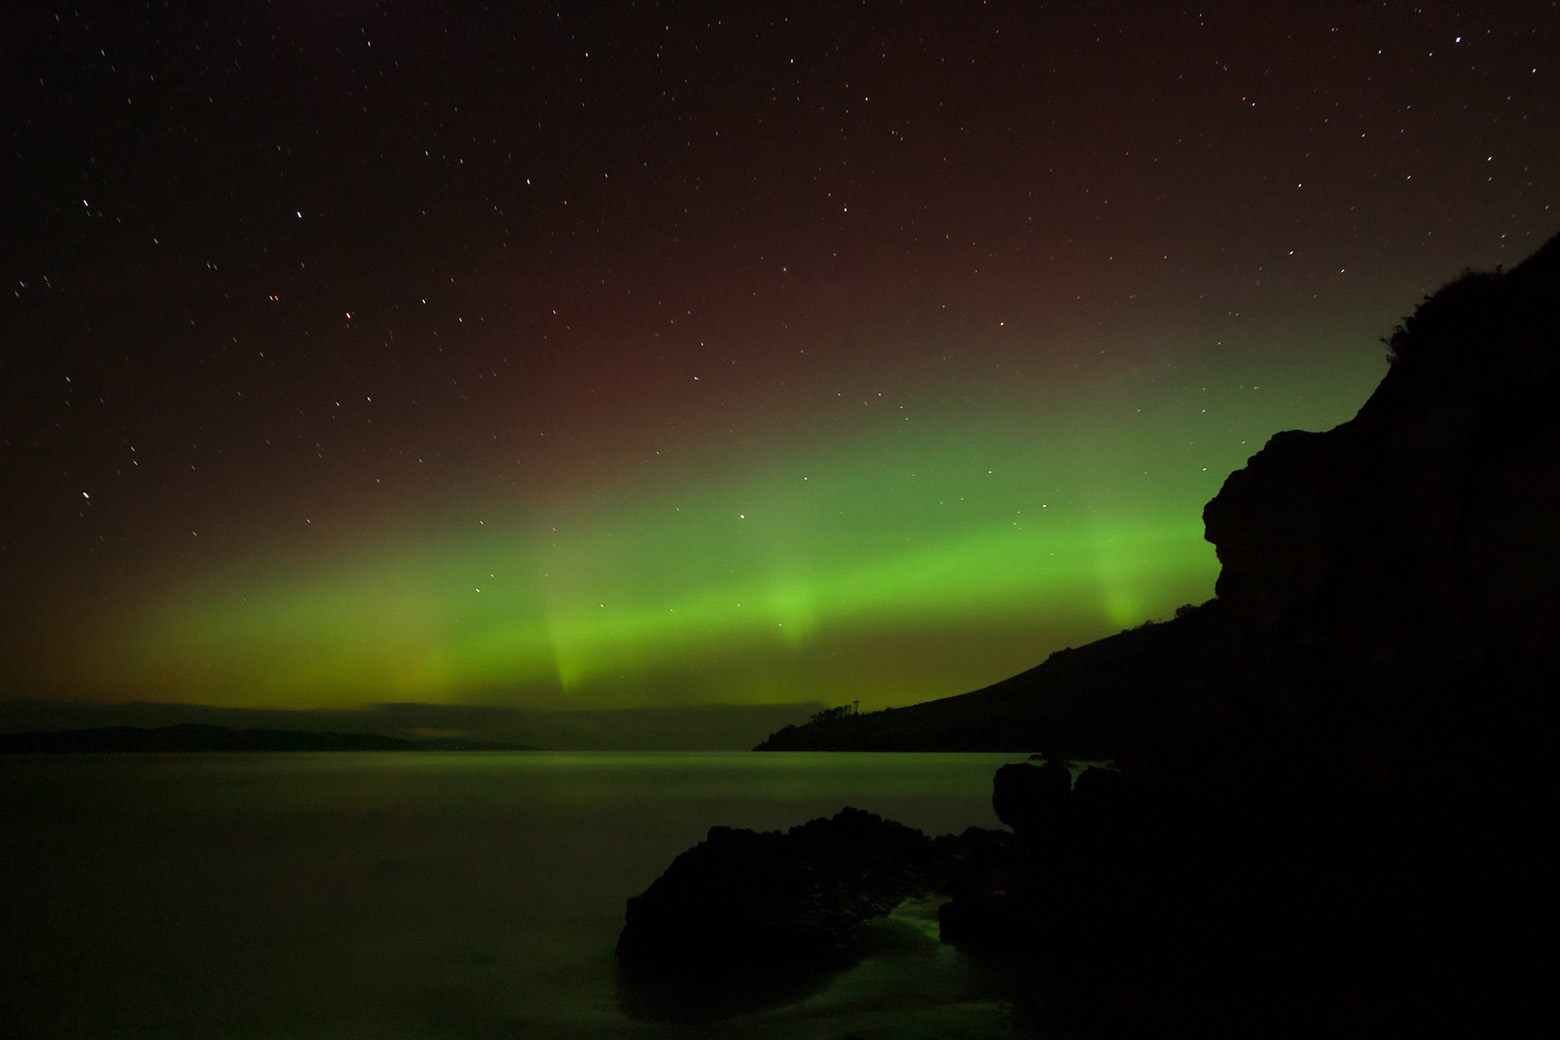 Tasmania Aurora Australis - Southern Lights